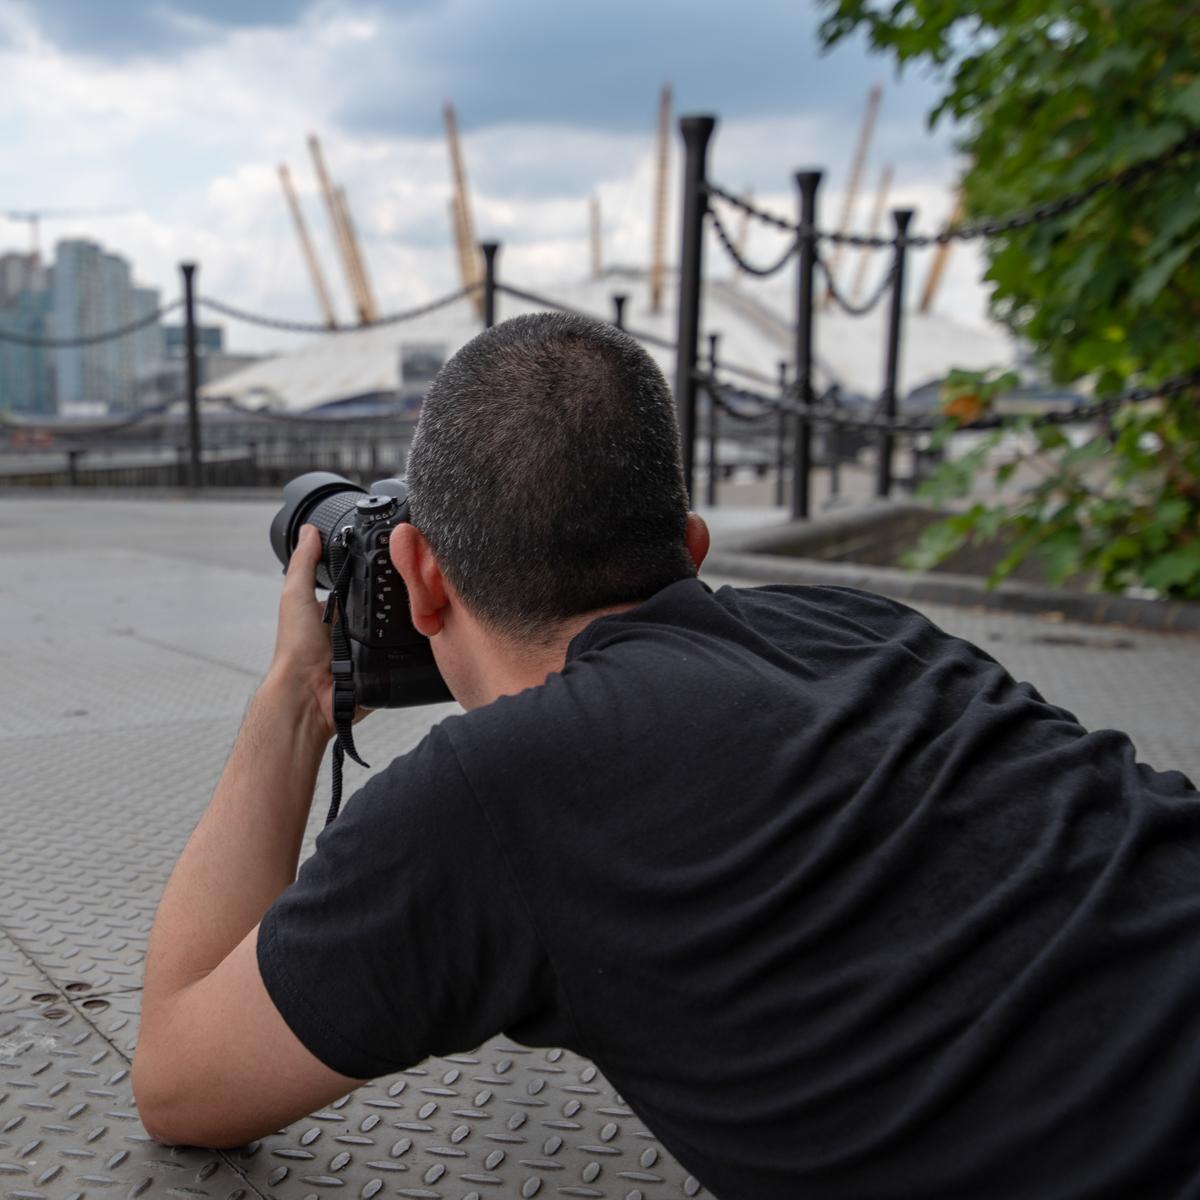 London-photographer-JC-Candanedo-Grey-Pistachio-Fashion-Corporate-Portraits-Headshots-Blog-Creative-Industry-London-self-doubt-complex-fear.jpg